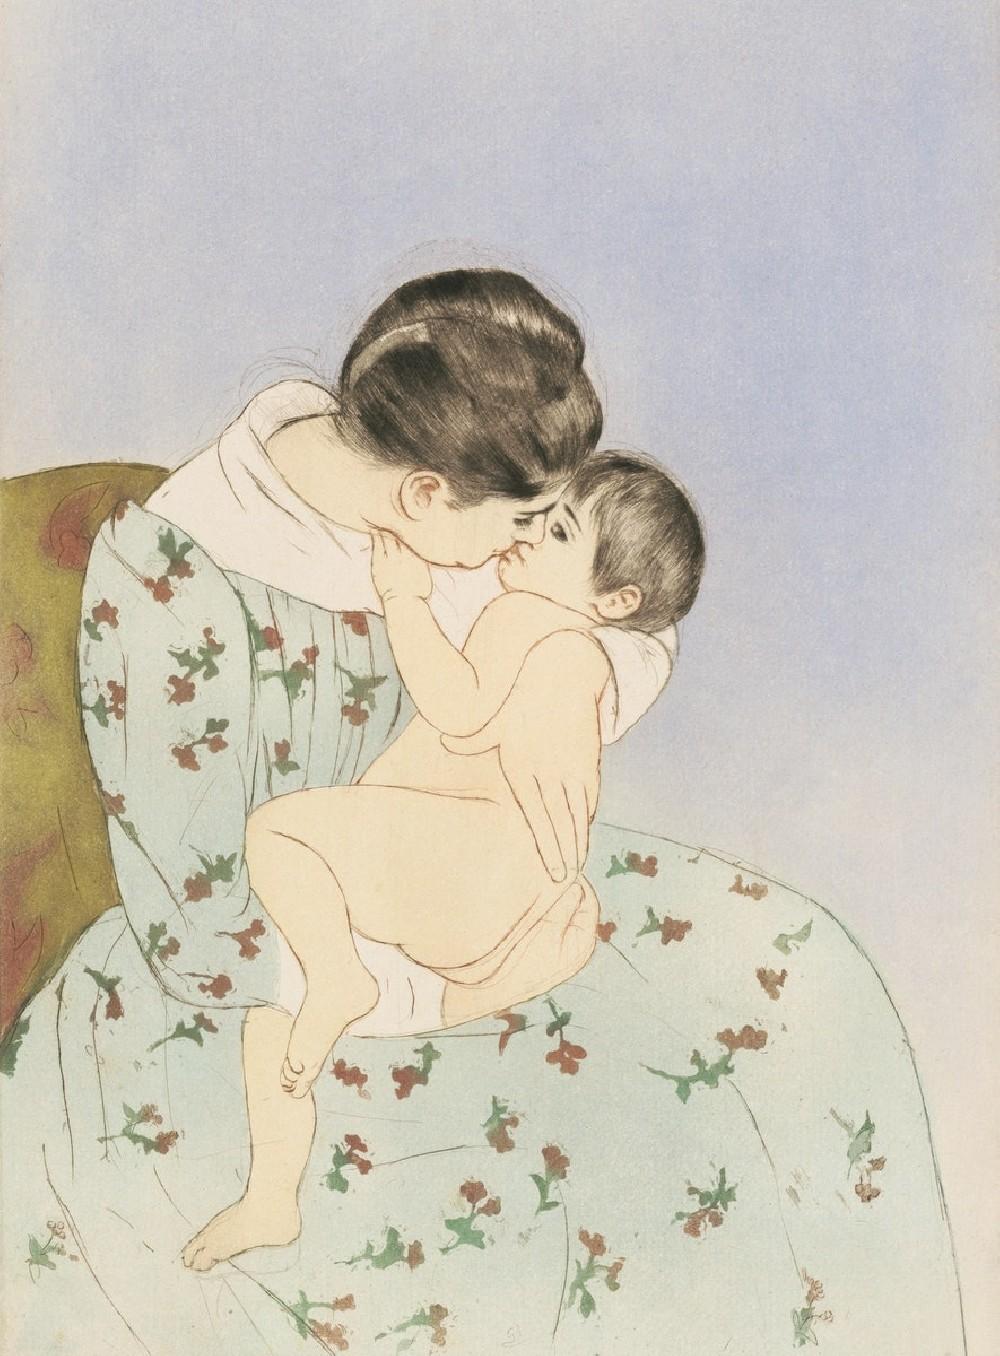 Mother's Kiss illustration